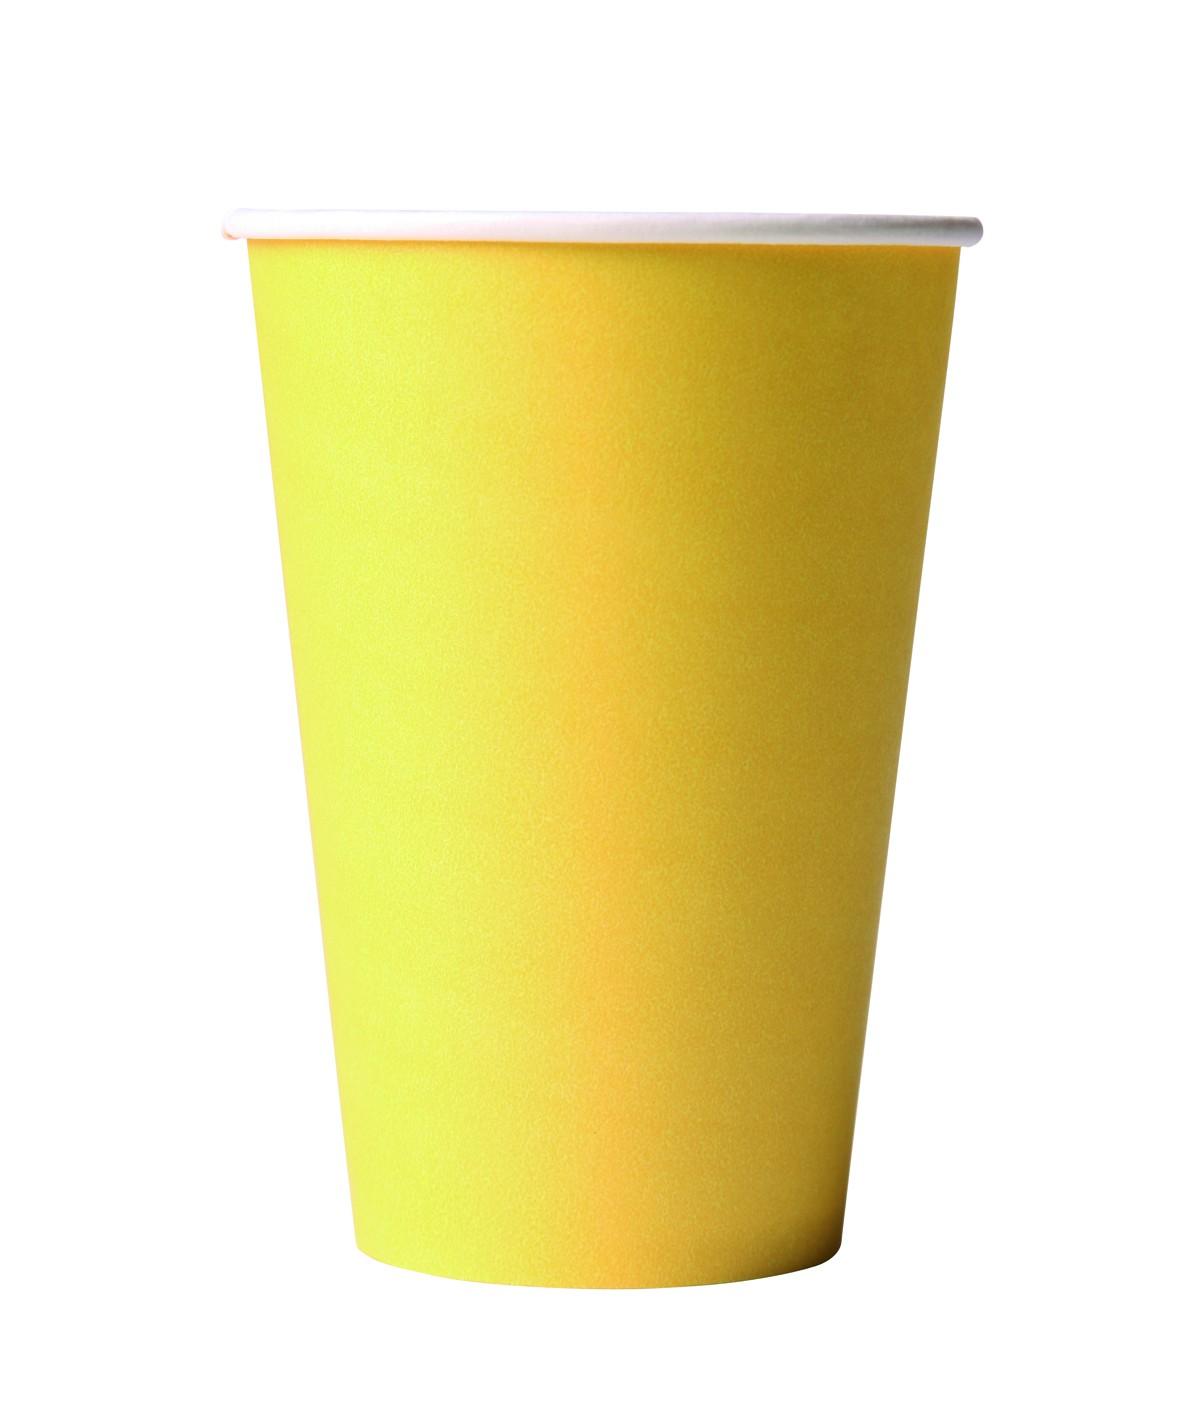 Werbeartikel: Kartonbecher gelb